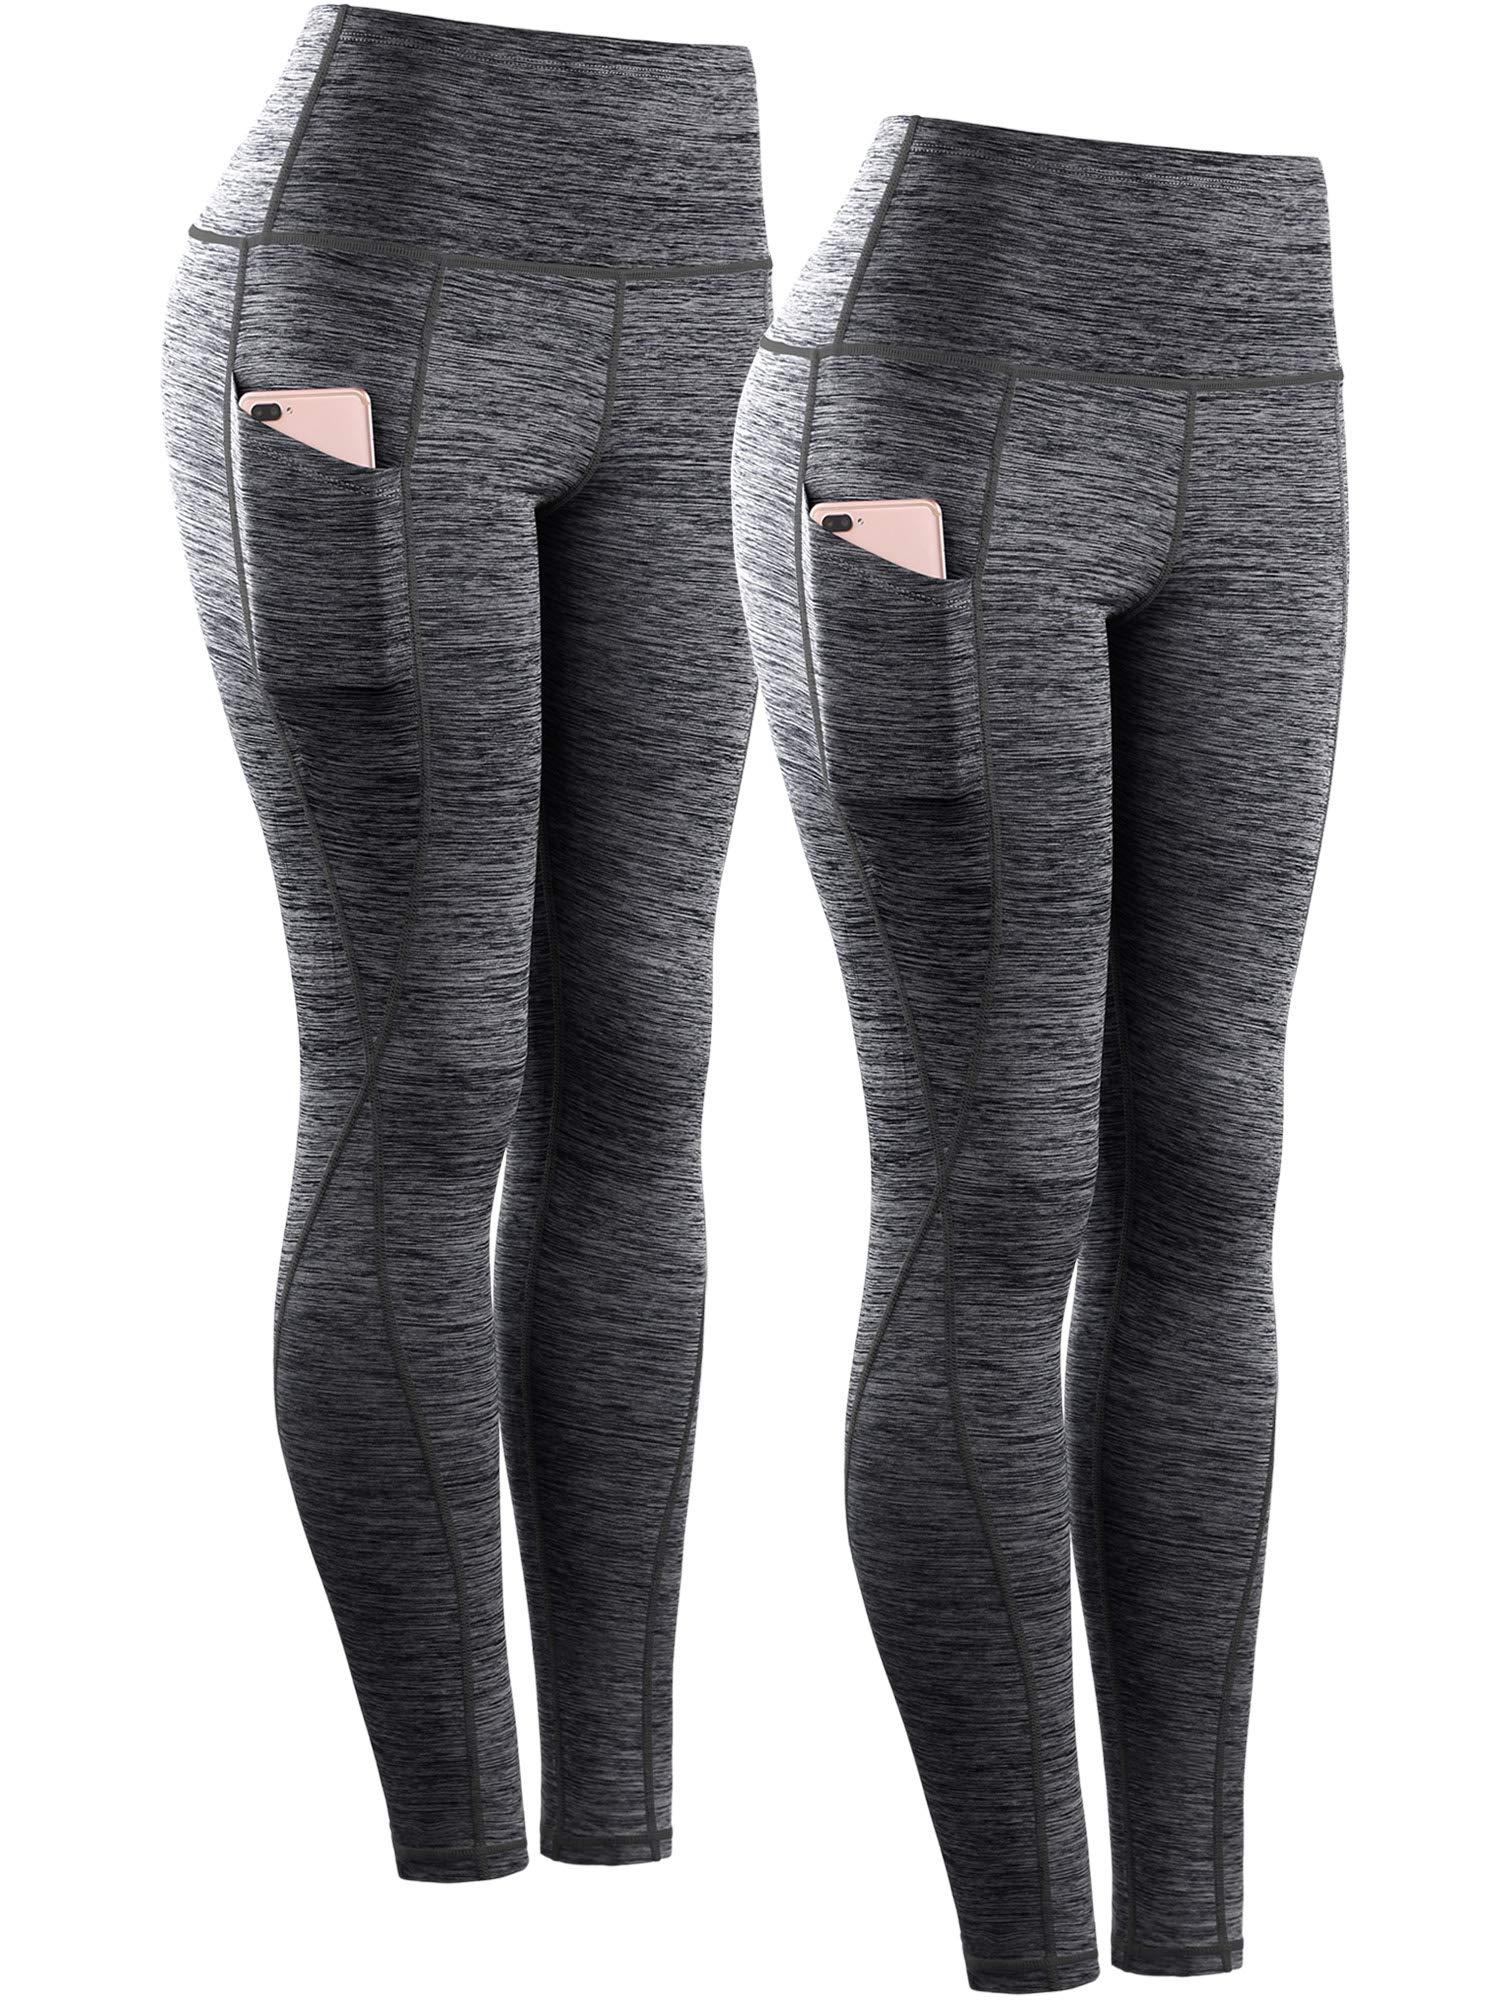 Neleus Tummy Control High Waist Workout Running Leggings for Women,9033,Yoga Pant 2 Pack,Black,S,EU M